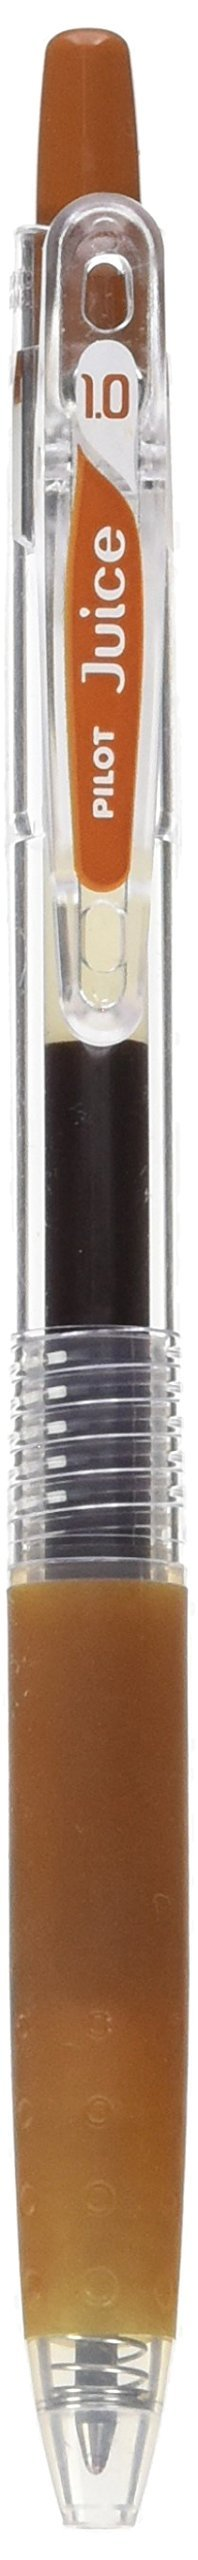 Pilot Juice 1.0mm Gel Ink Ballpoint Pen, Brown (LJU-10M-BN)